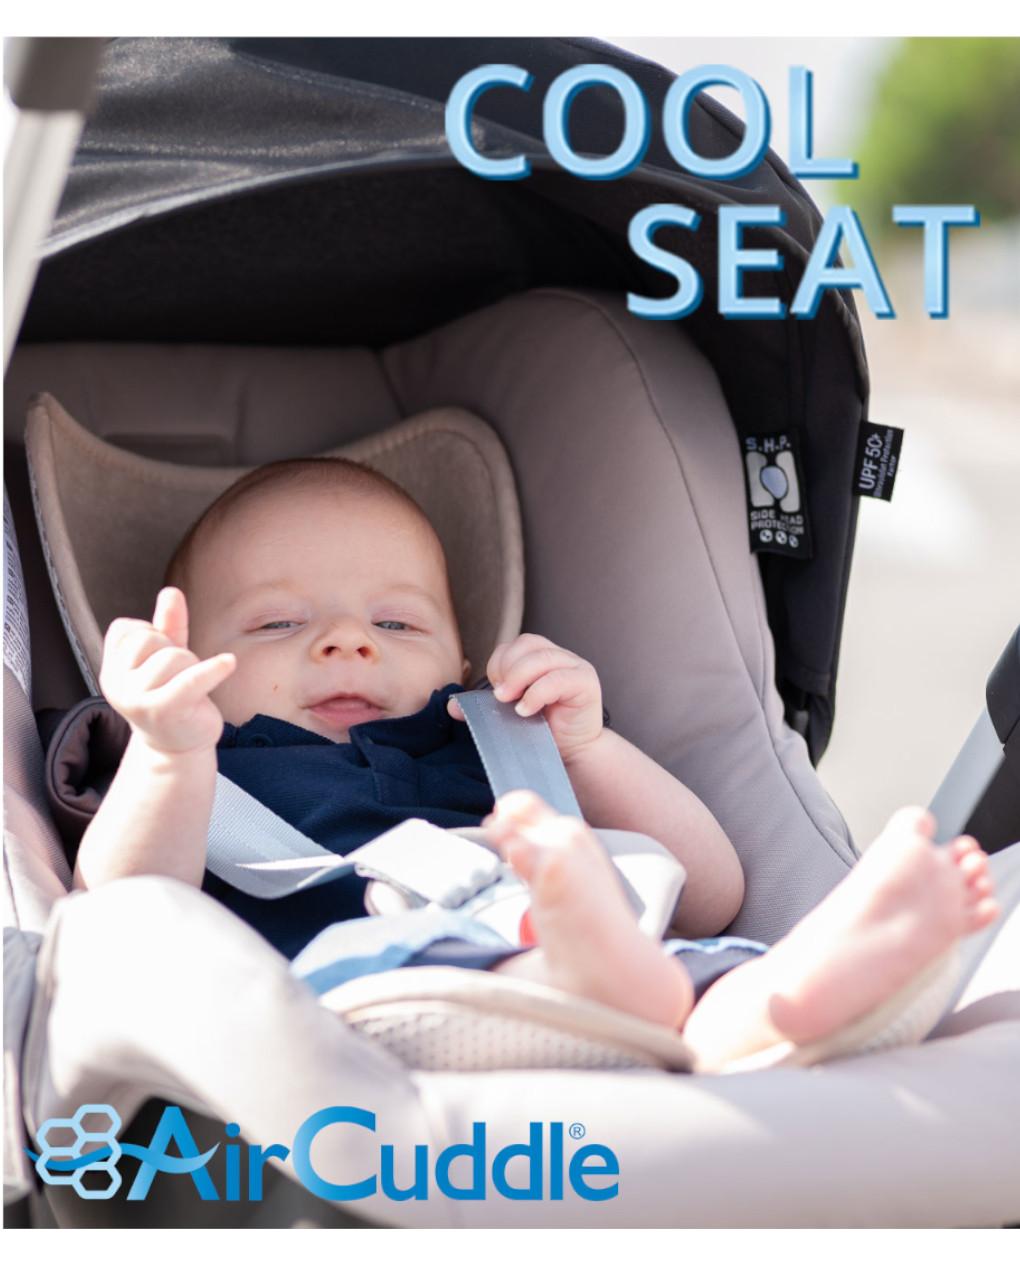 Cool seat foderina gruppo 0 aircuddle sabbia - AirCuddle